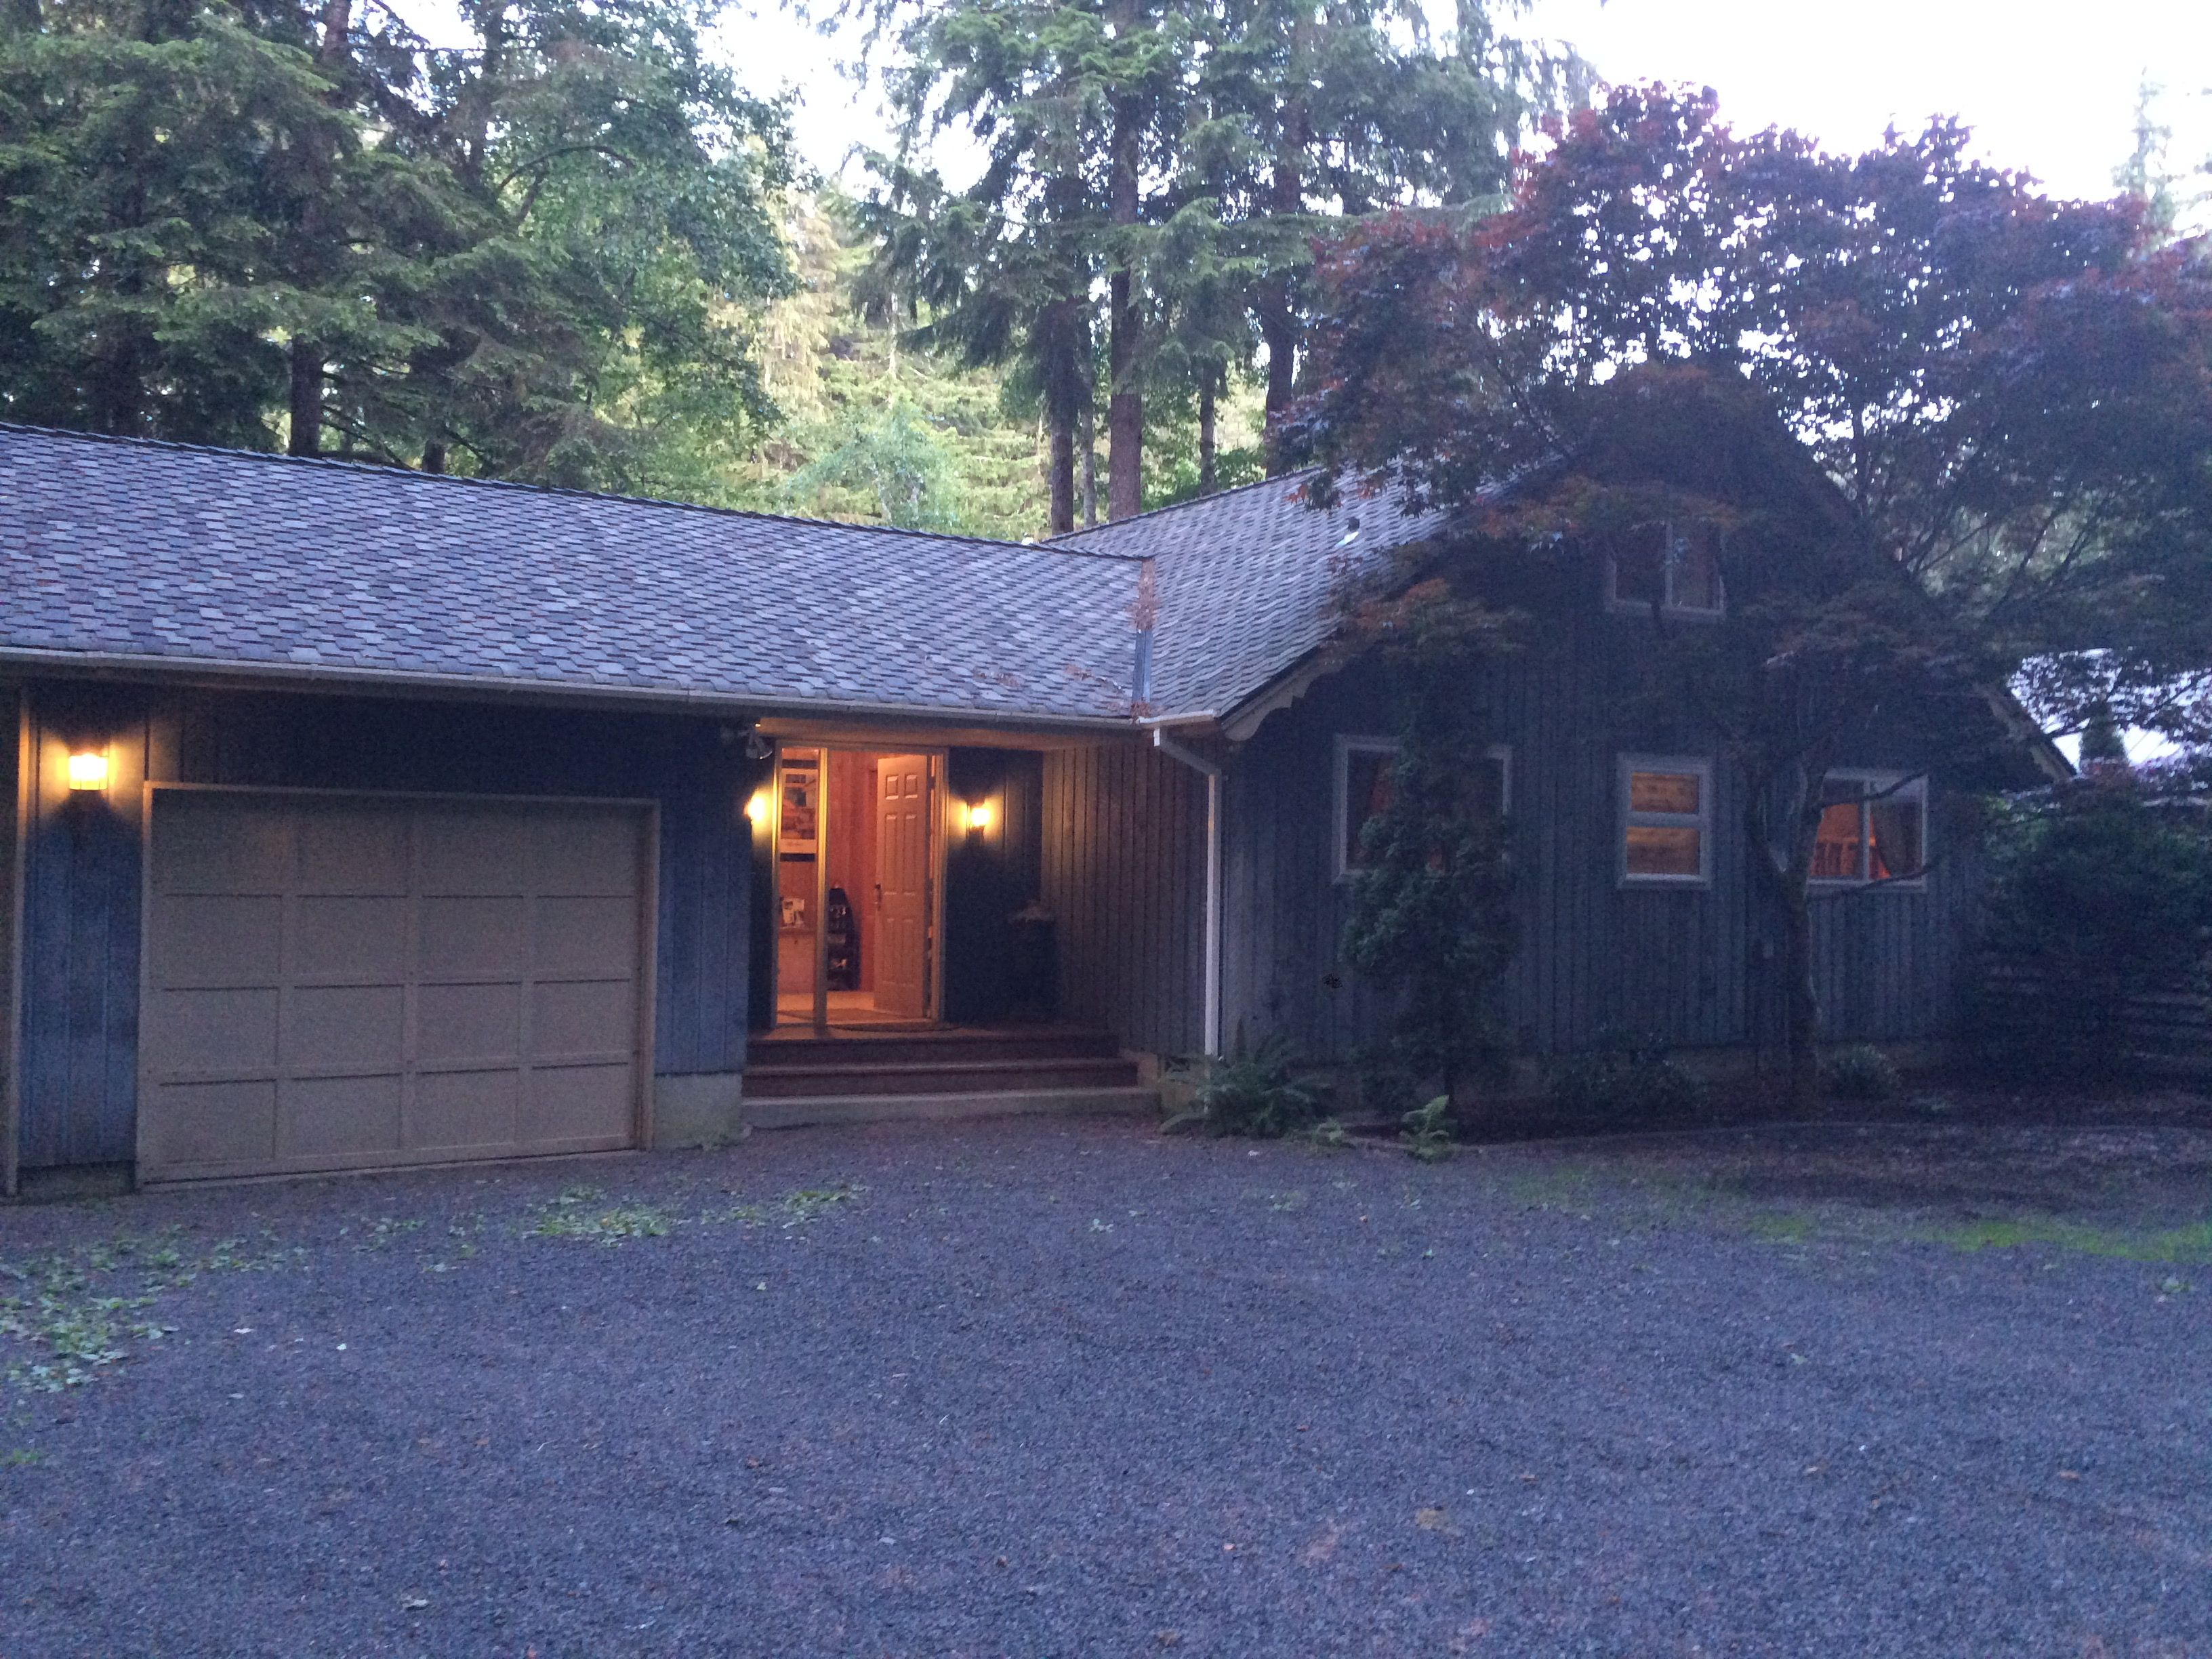 park cottages floann pet rentals s cabins rocky friendly cabin denver national pin mountain